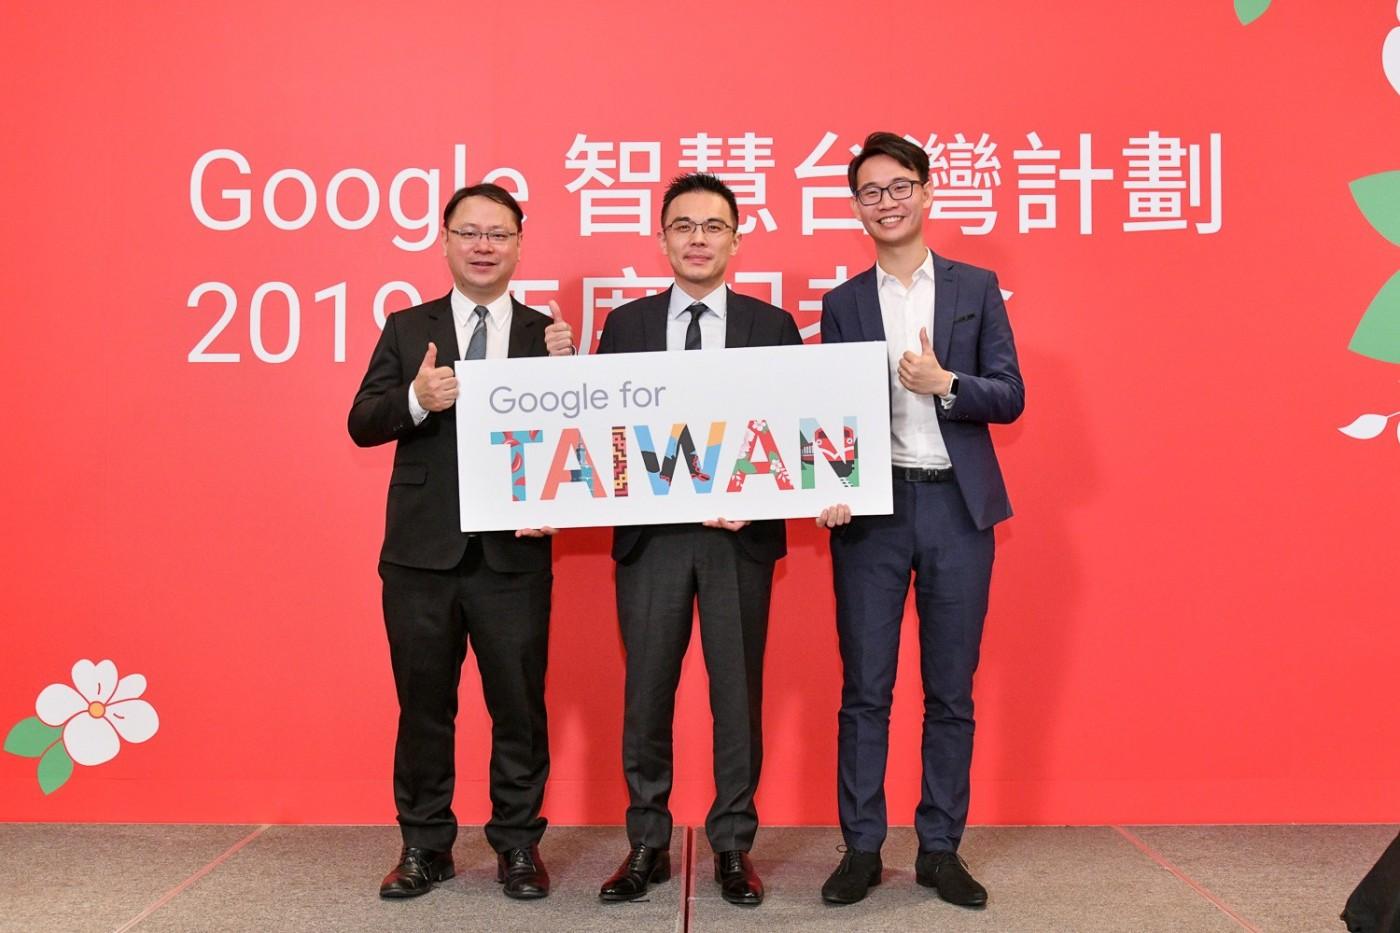 Google智慧台灣計畫滿週年,5大領域助攻有成